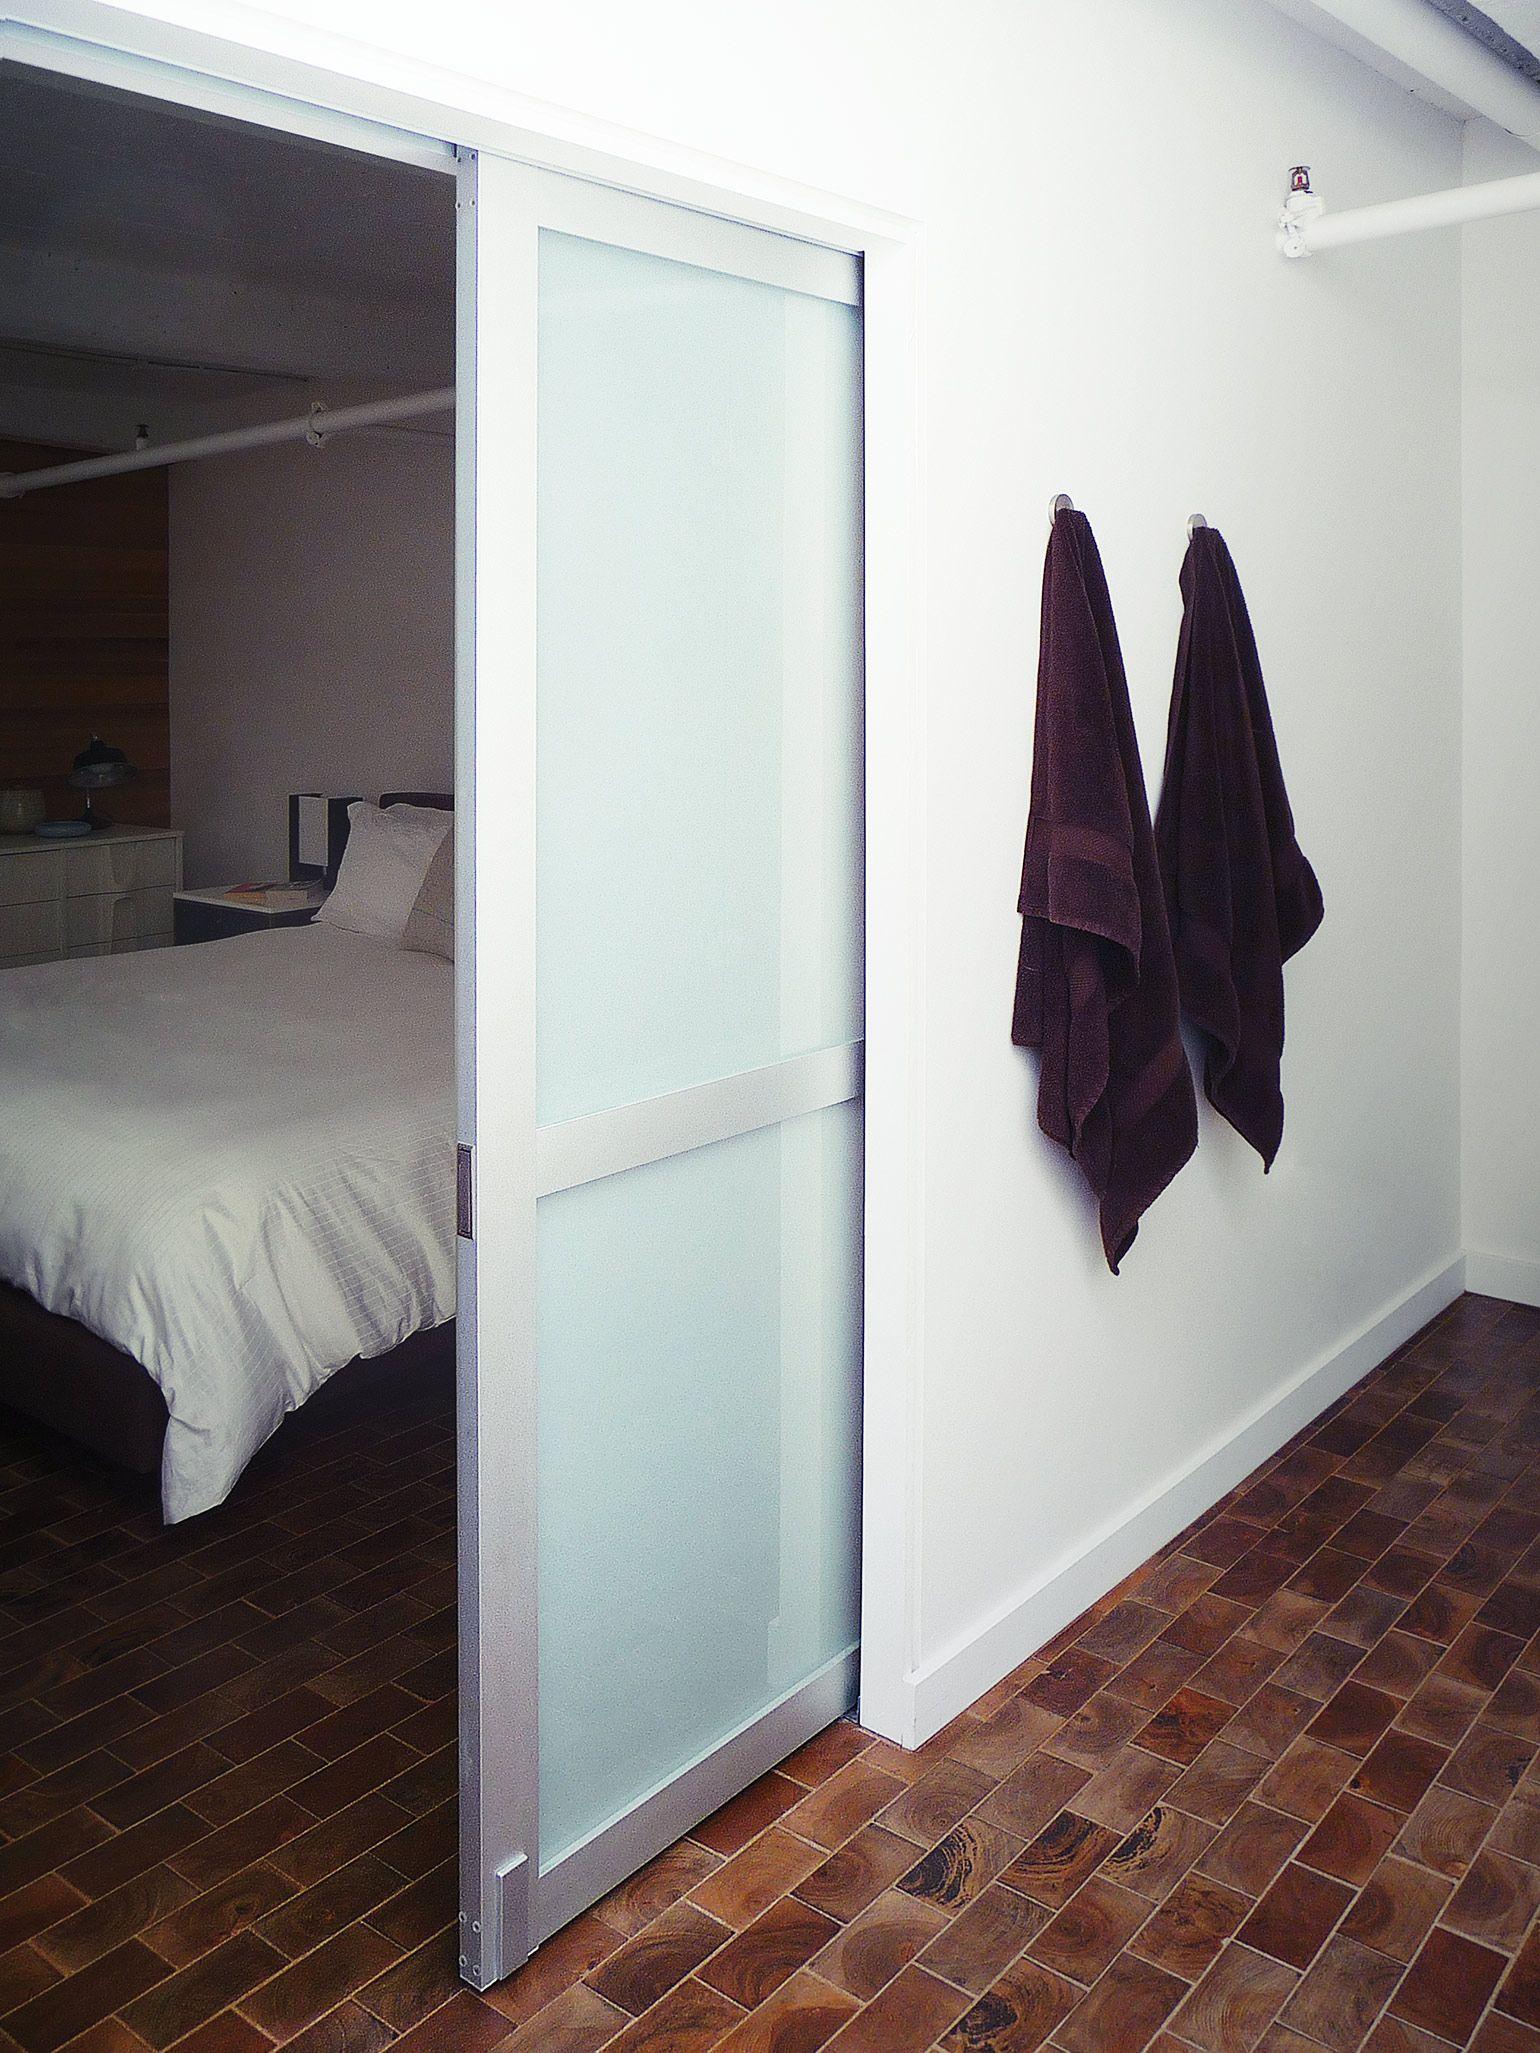 Milky Glass Bathroom Room Divider With Silver Frame Inspirational Gallery Sliding Bathroom Doors Exterior Doors With Glass Sliding Doors